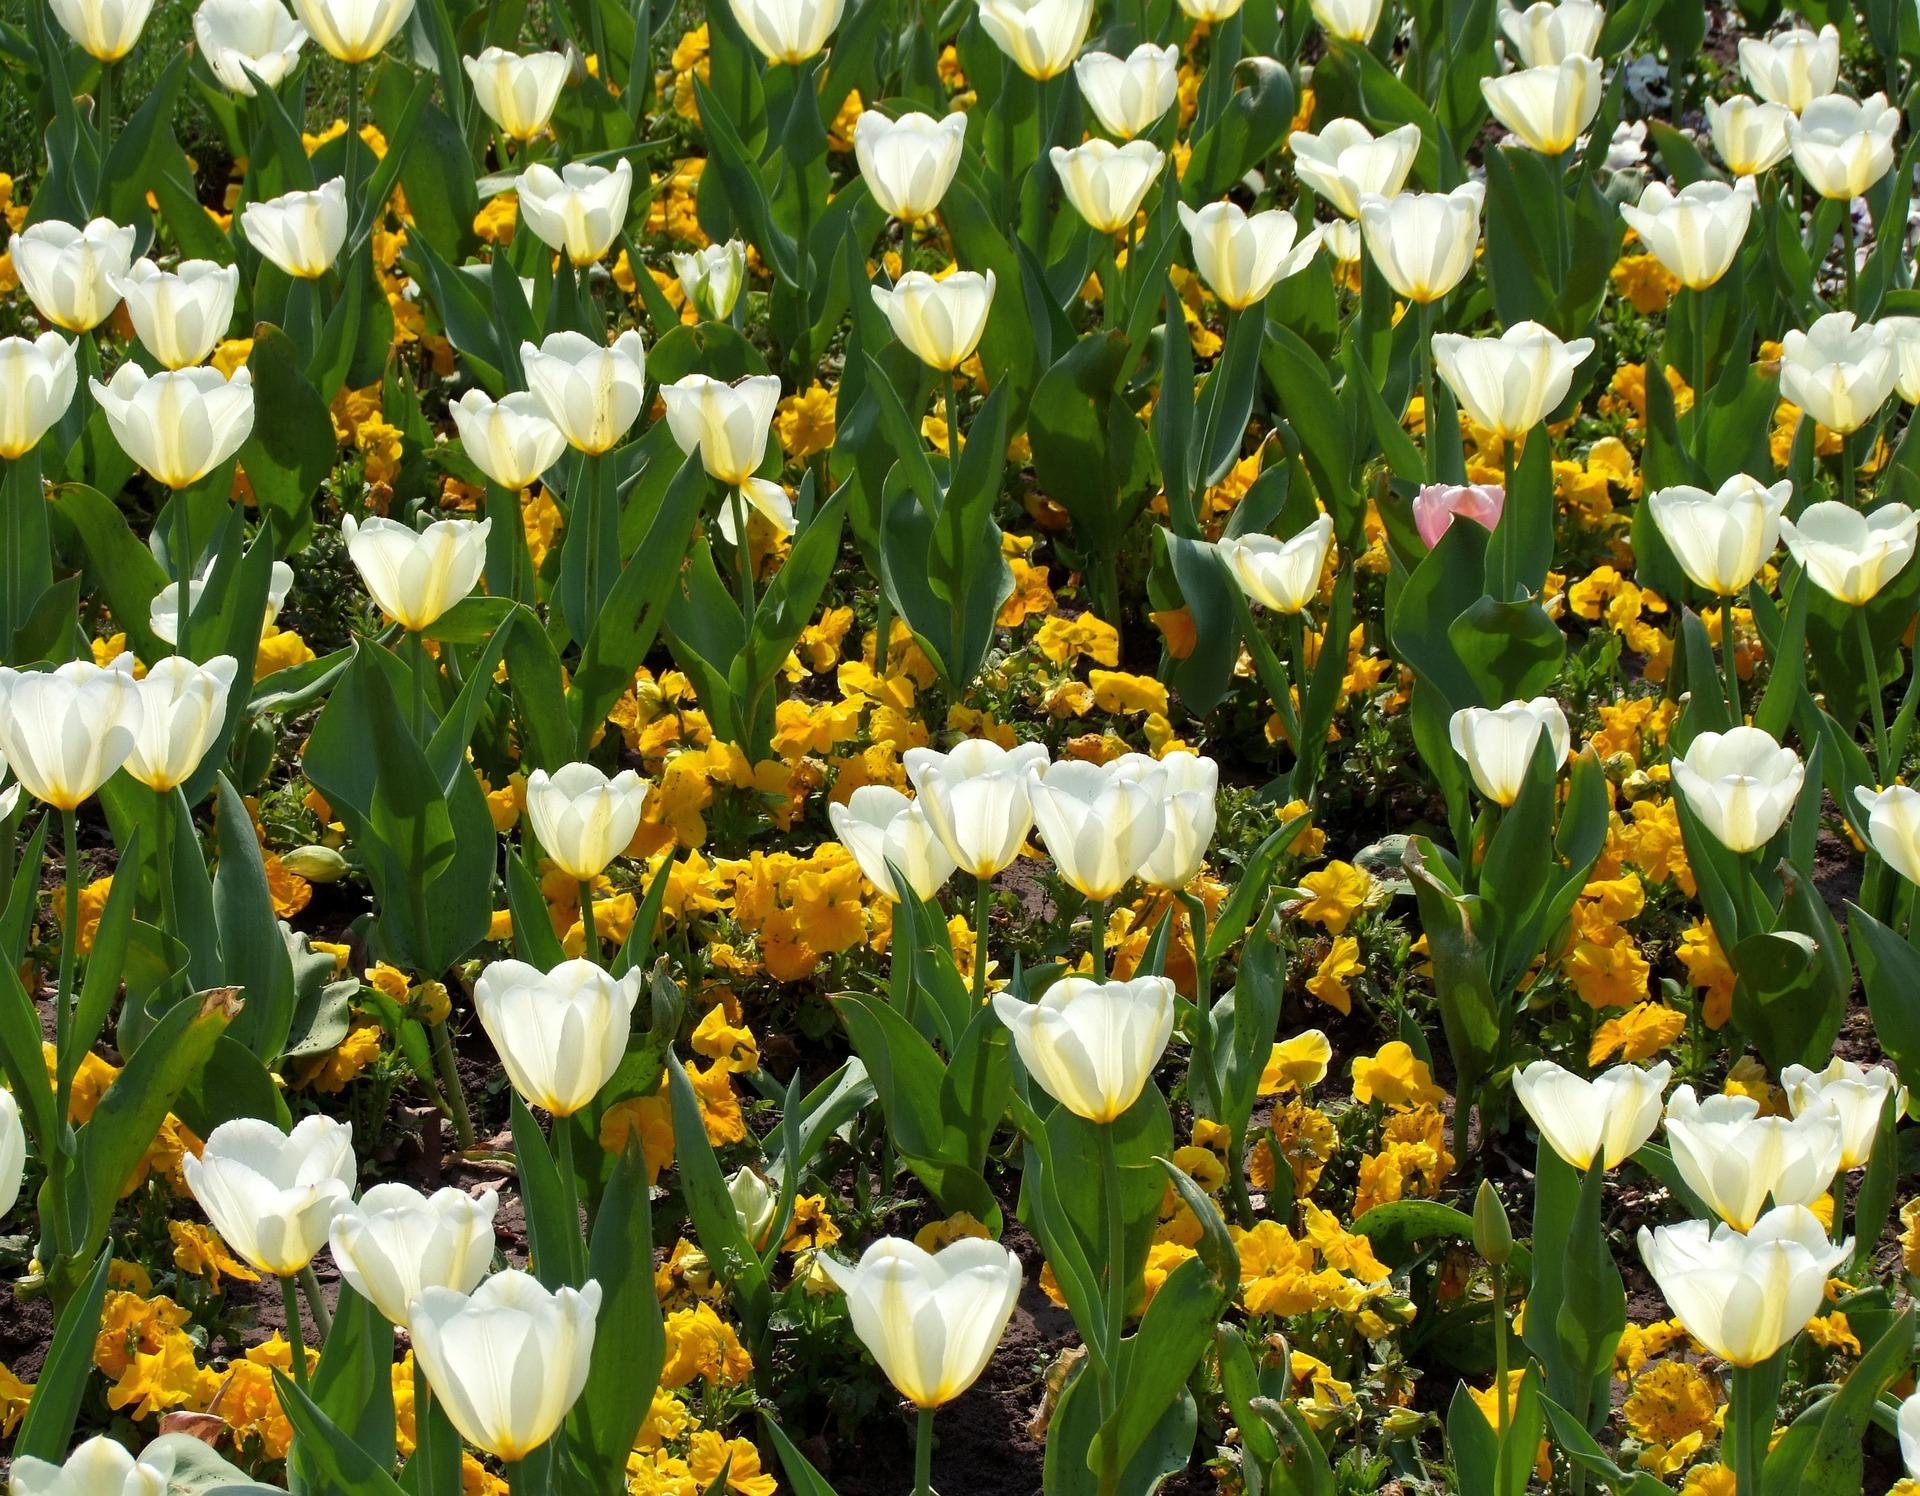 tulips-5251572_1920